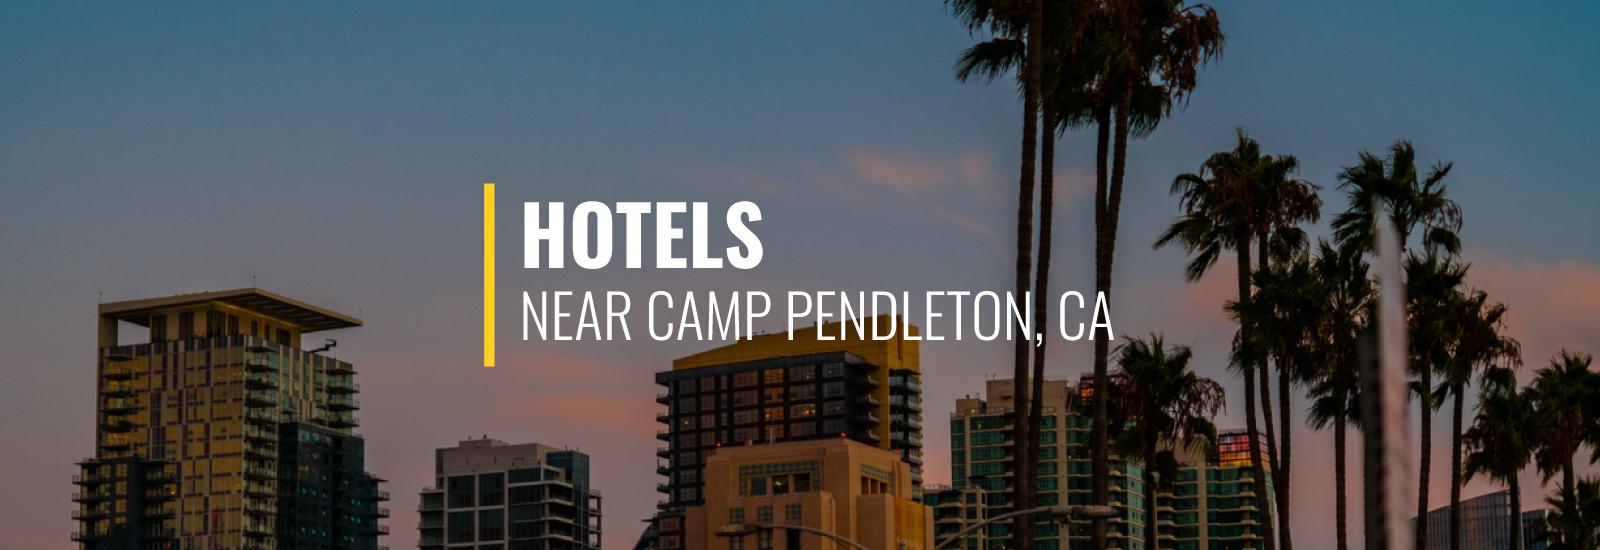 Hotels Near Camp Pendleton California